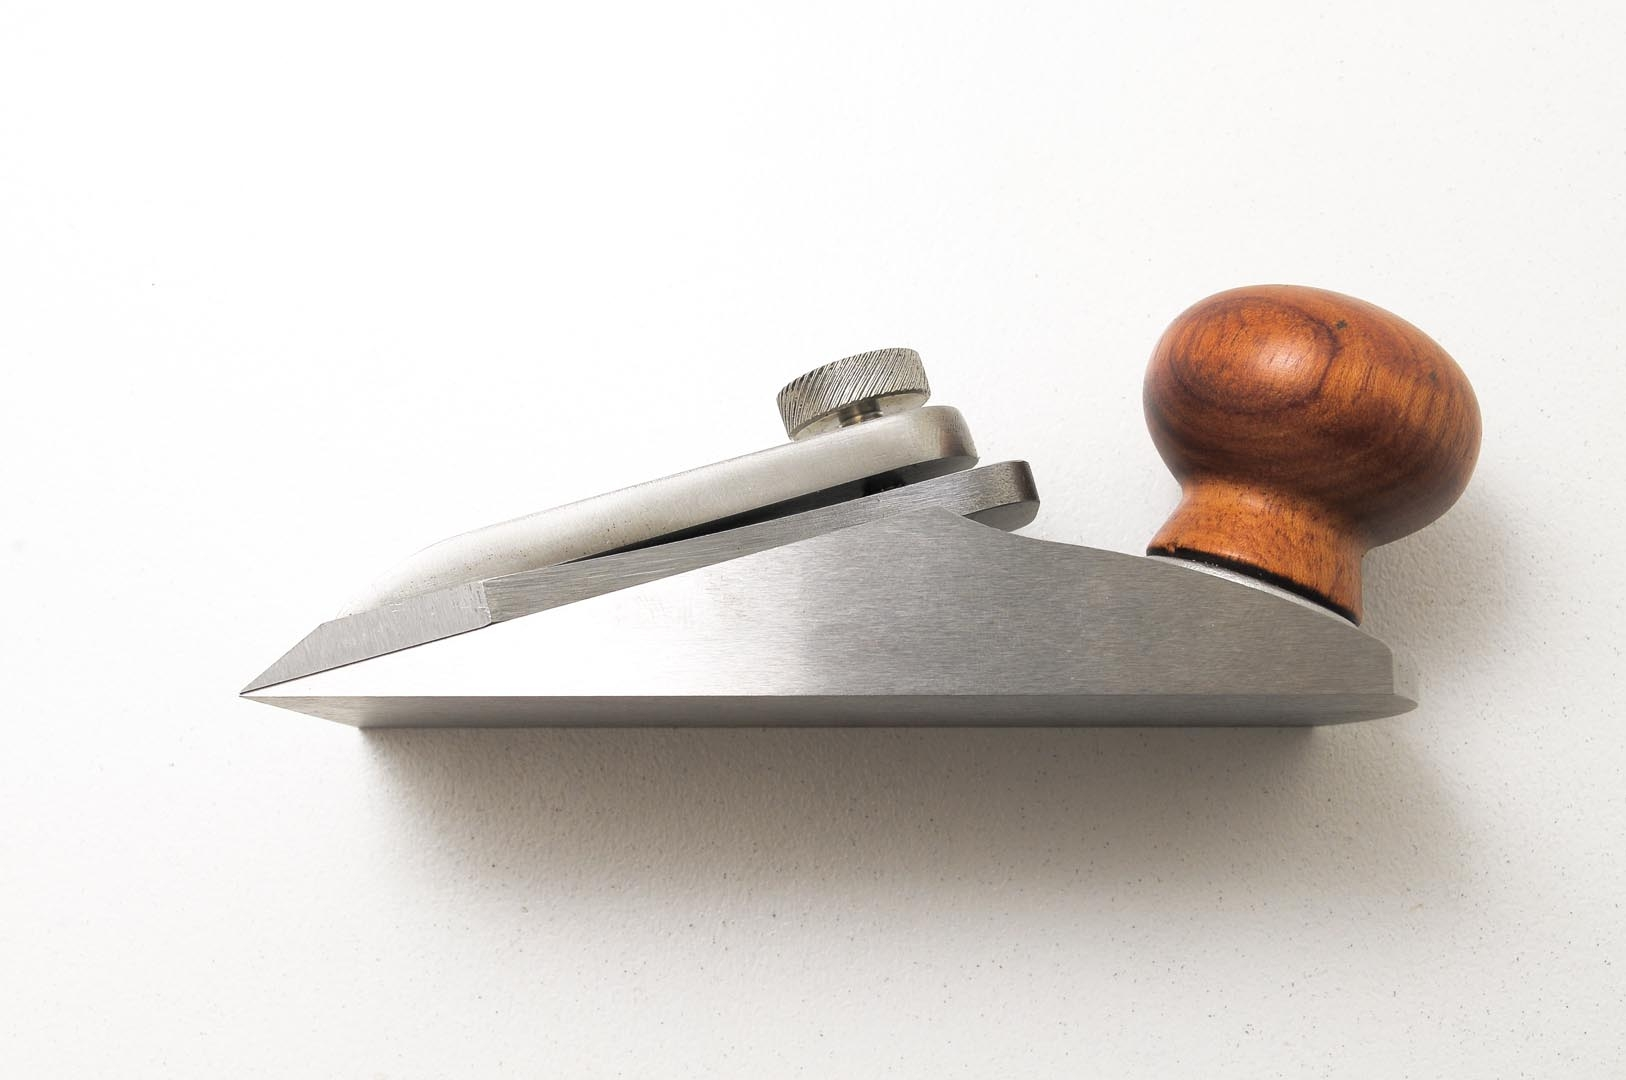 151301-Cepillo de formon pequeño WoodRiver 151301-max-5.